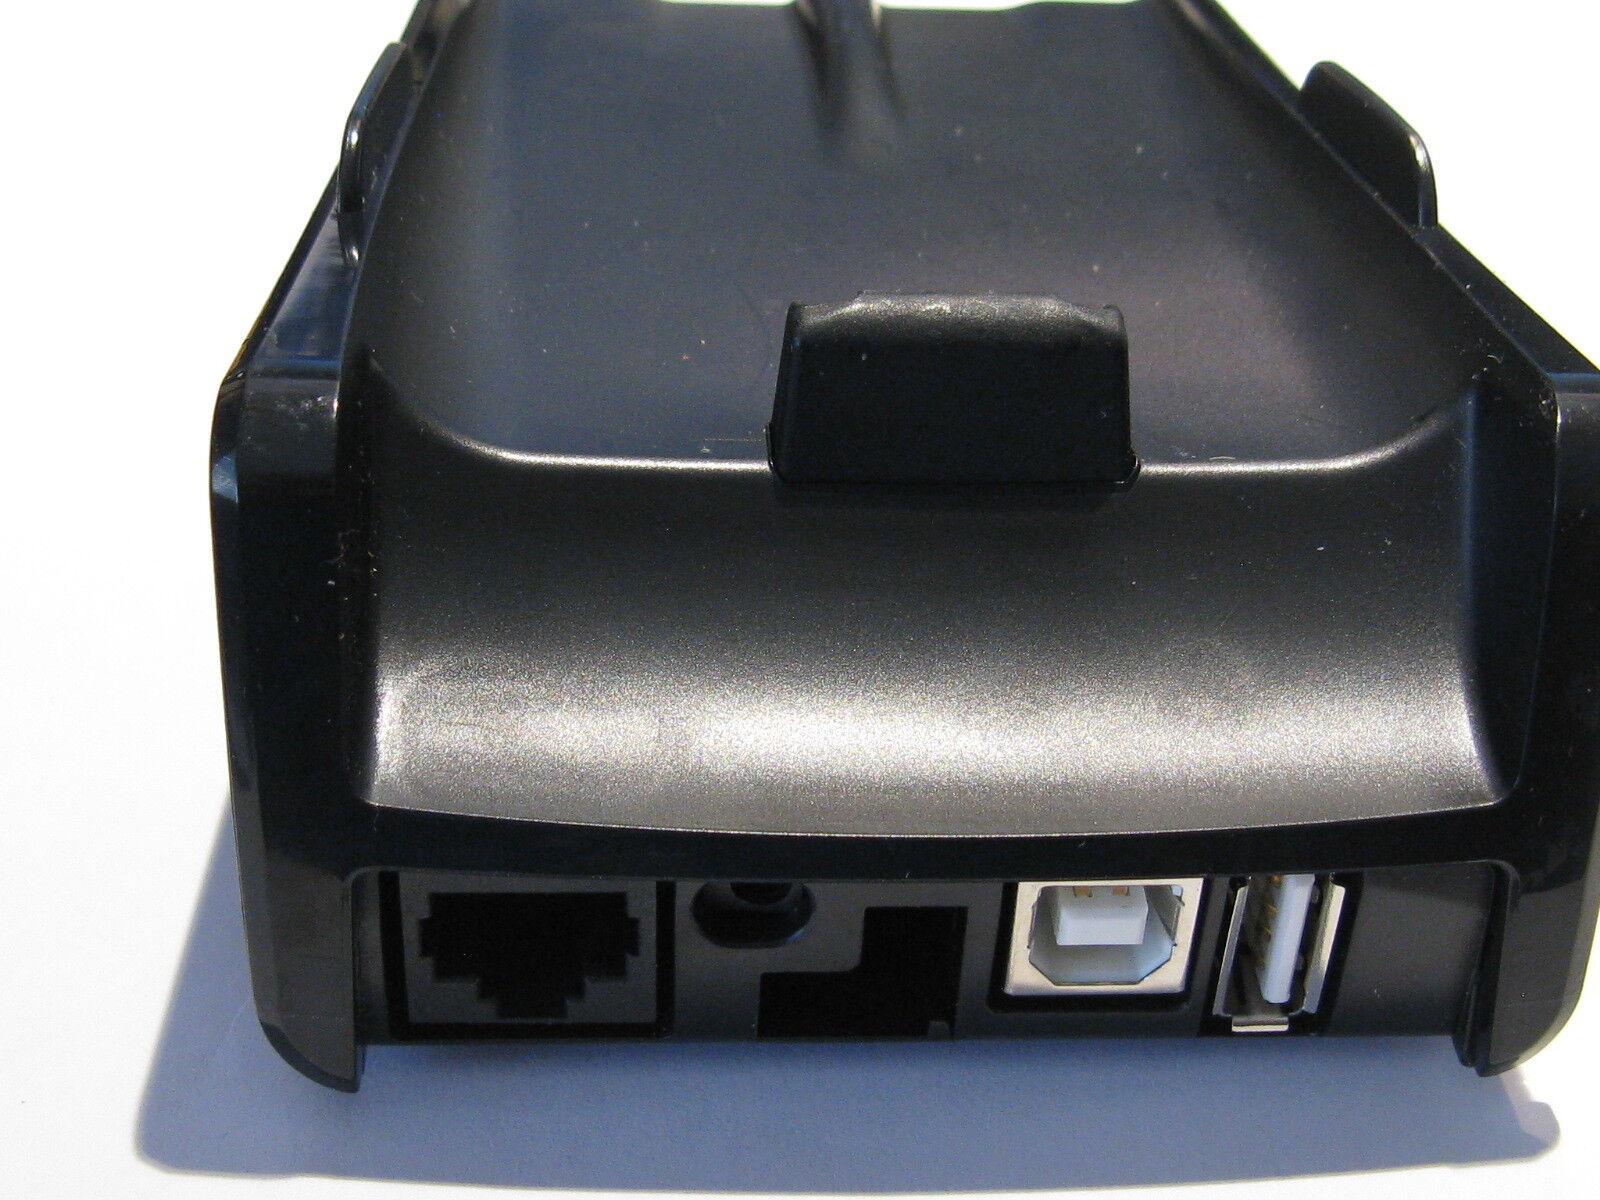 Ingenico iWL250, iWL255, charging Base P/N iWL200-01P1327B | Wundr-Shop